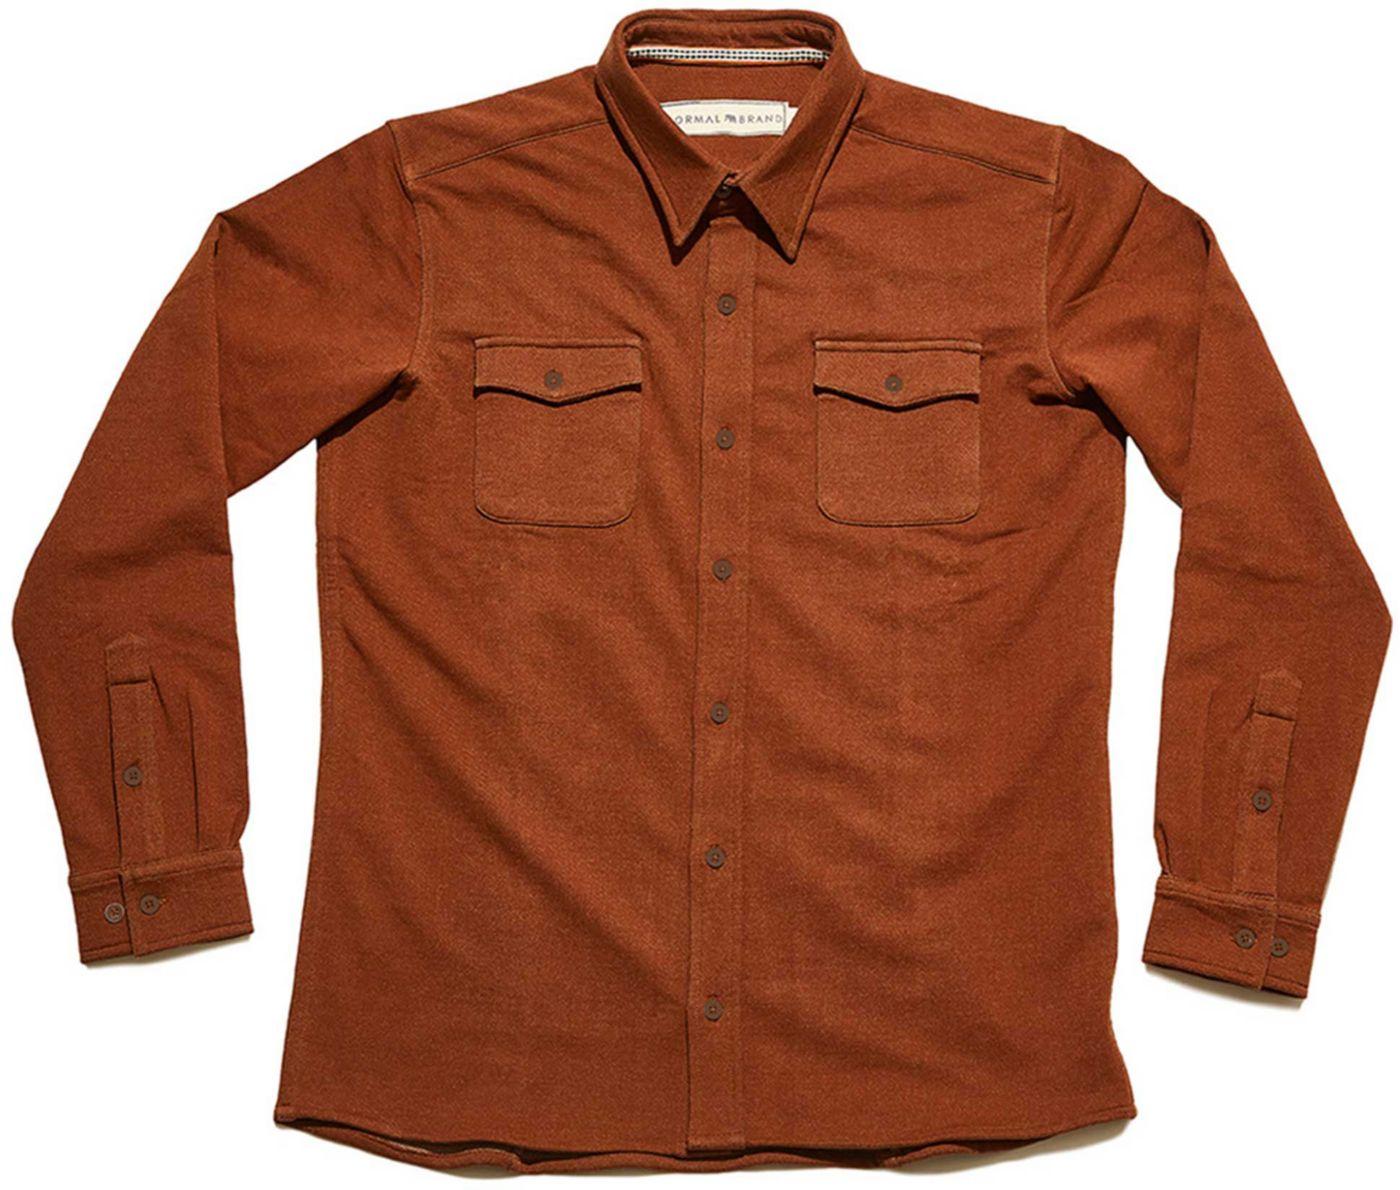 The Normal Brand Men's Knit Workman Shirt Jacket